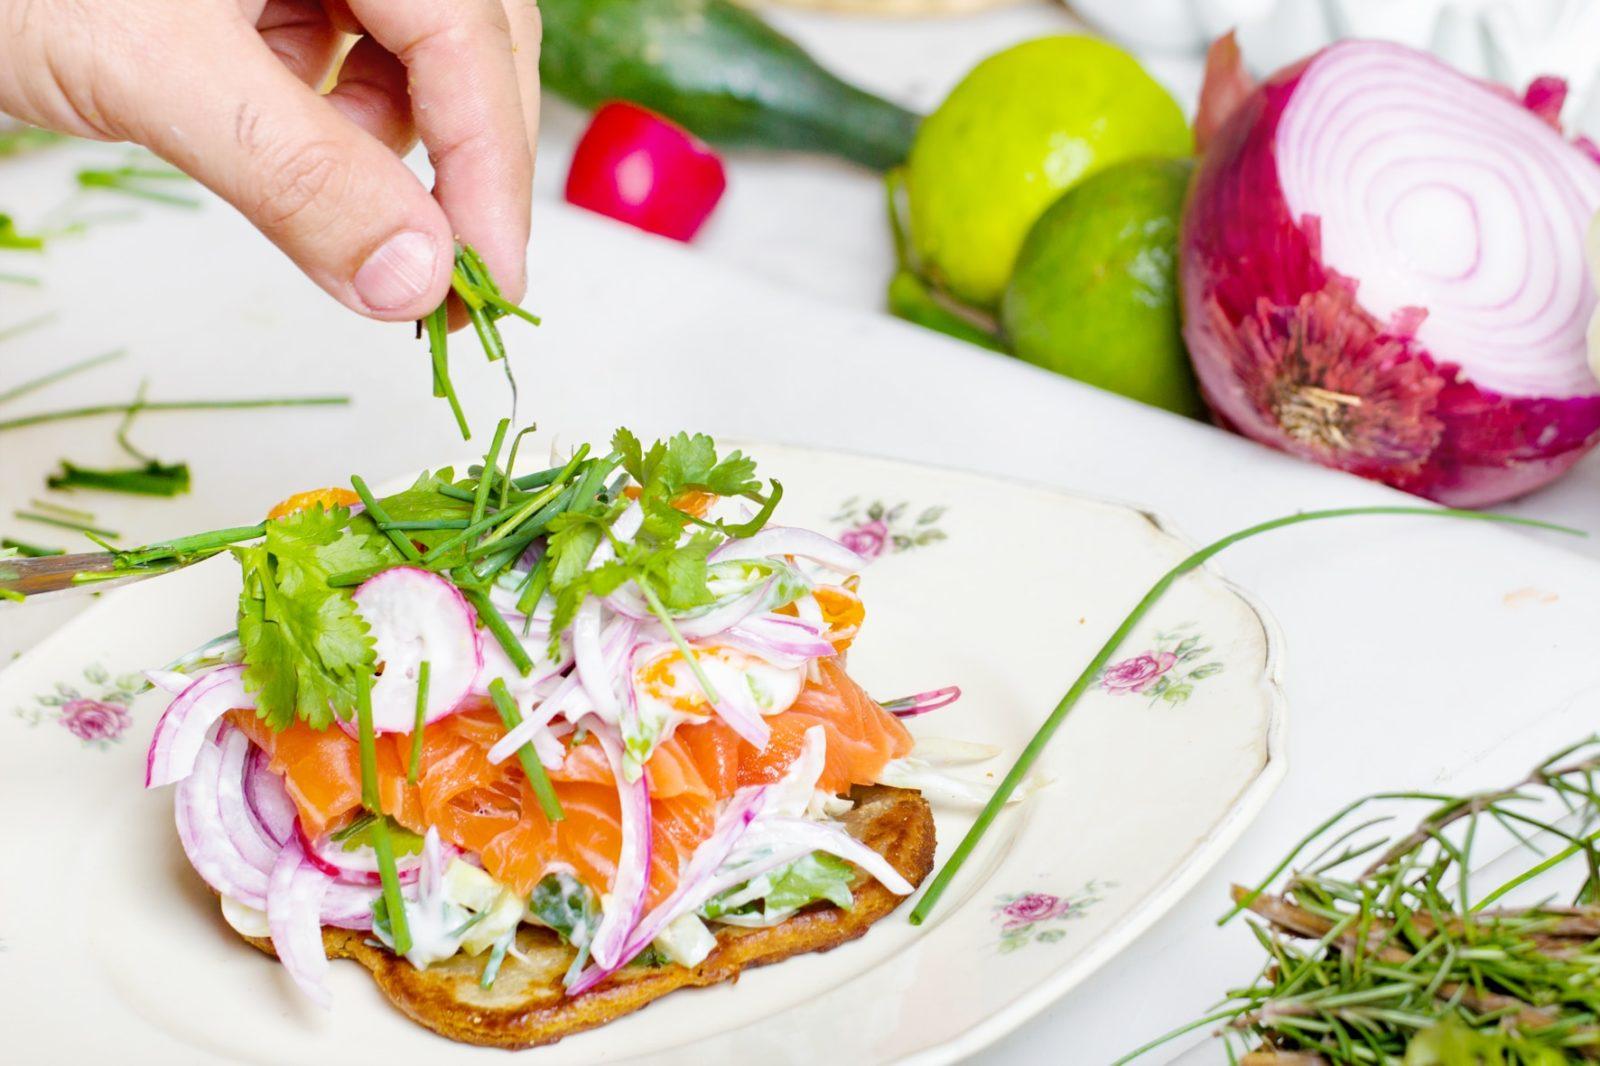 healthy summer recipes for dinner